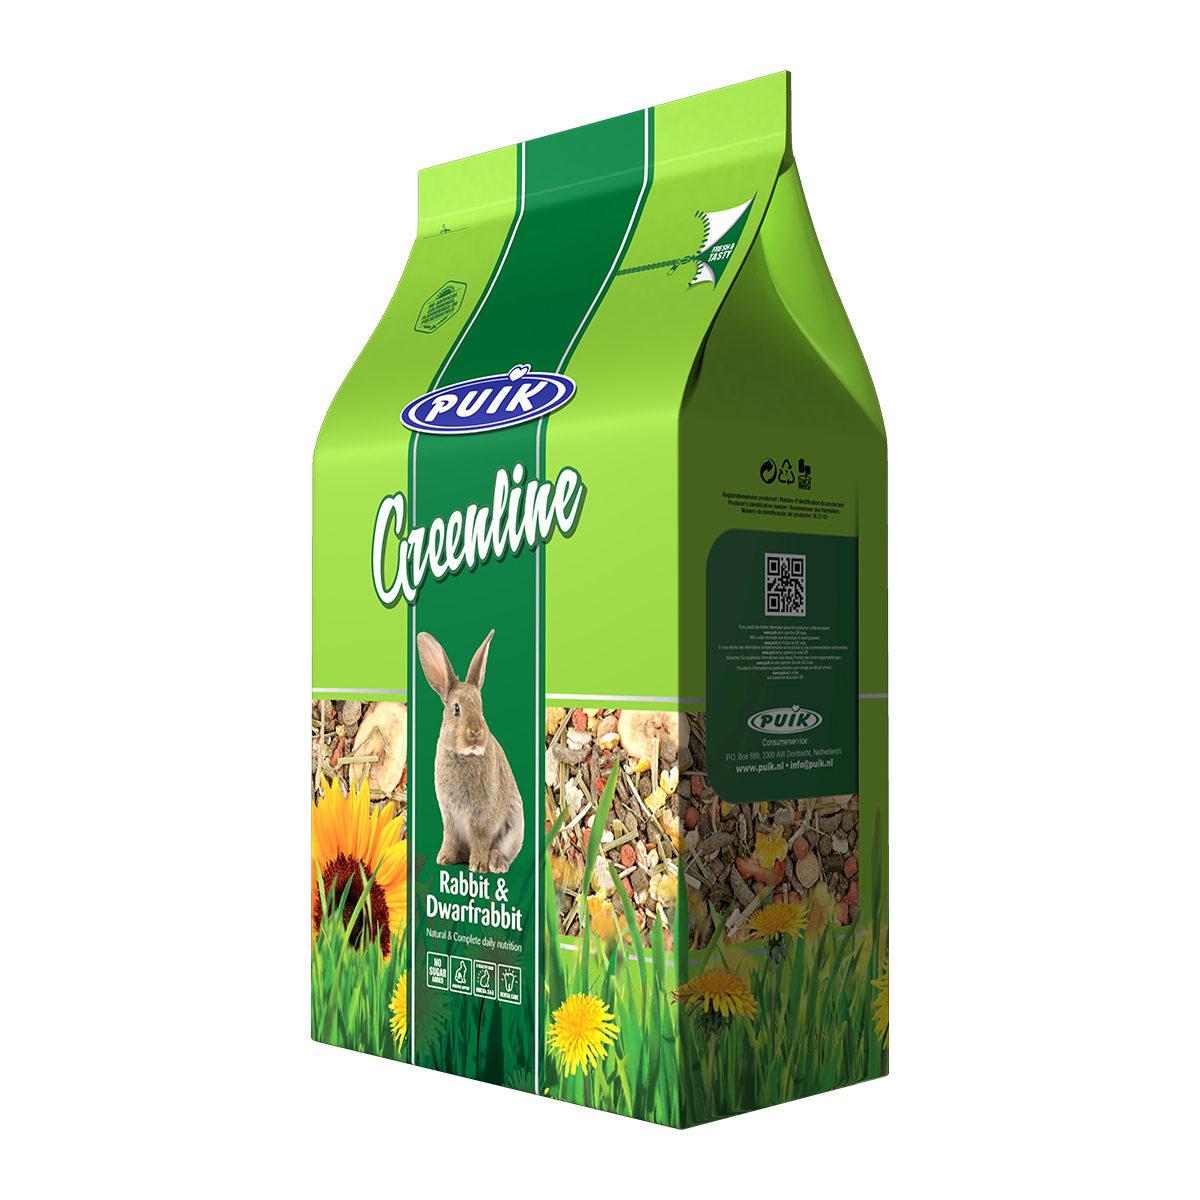 Puik Greenline Konijn & Dwergkonijnvoer 1,5 kg